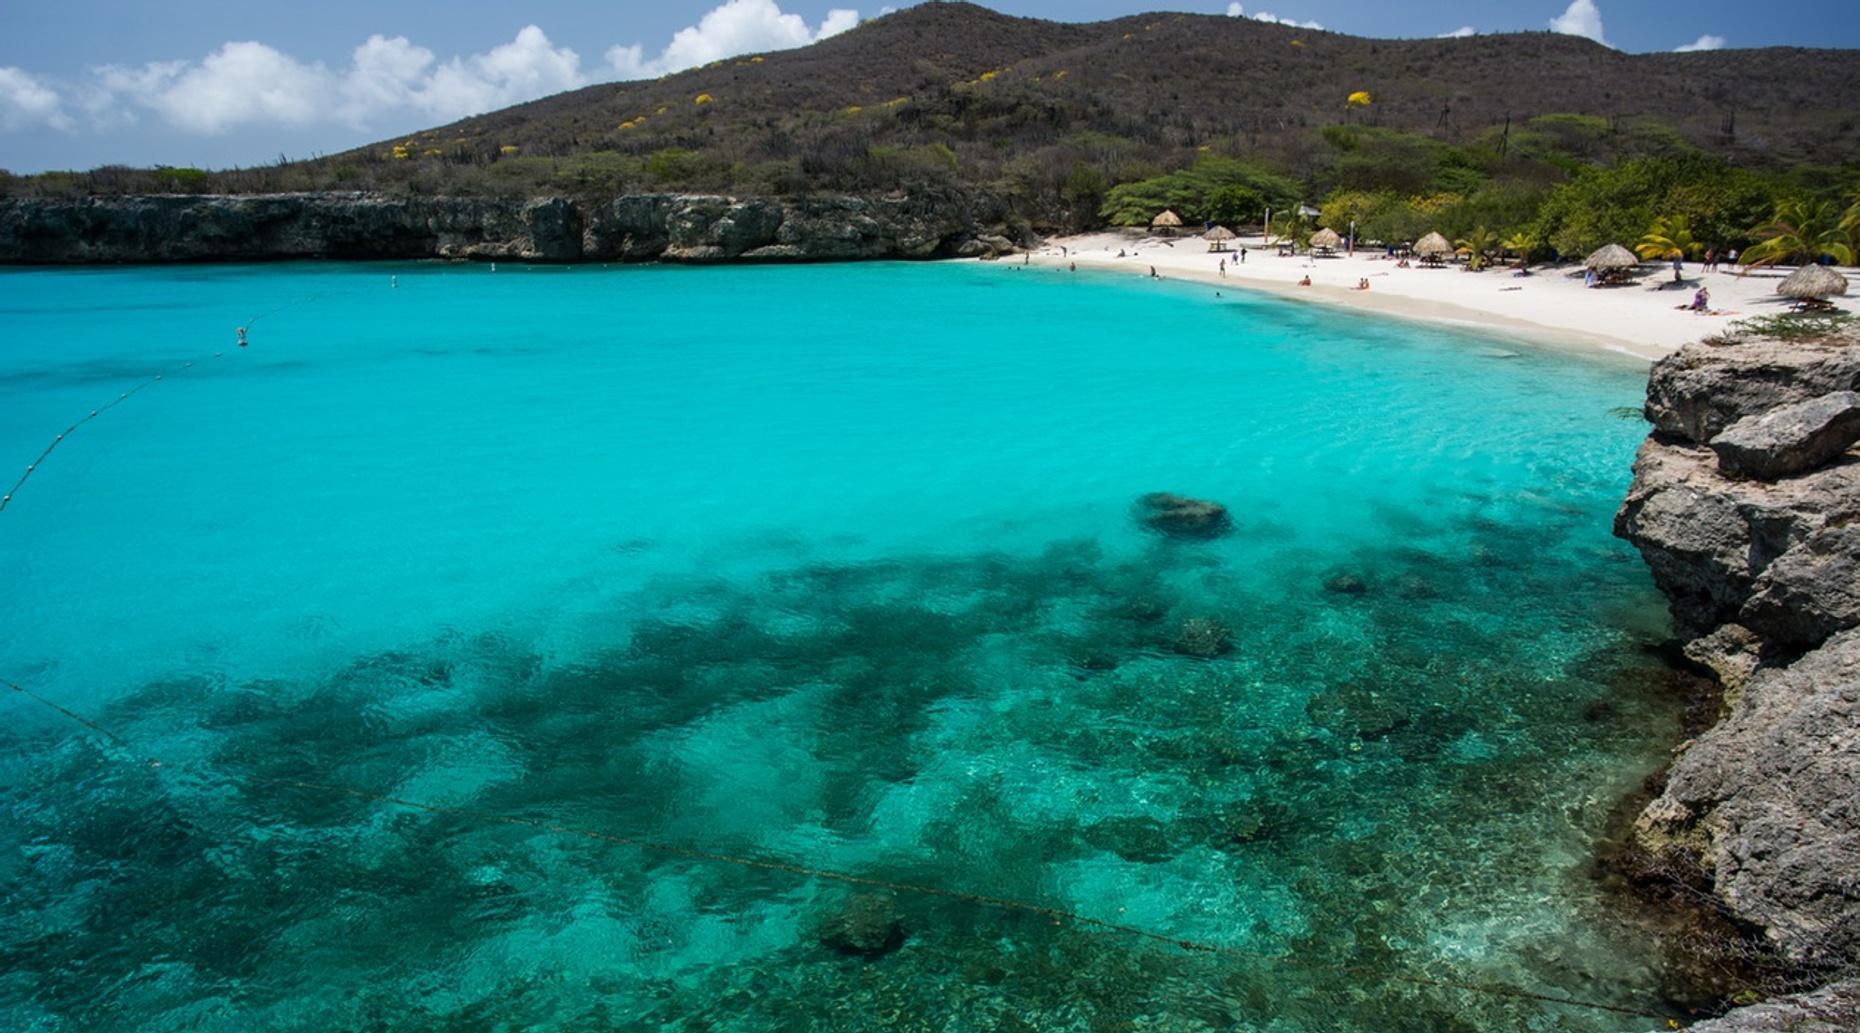 Private Tropical Oasis Getaway in Nassau